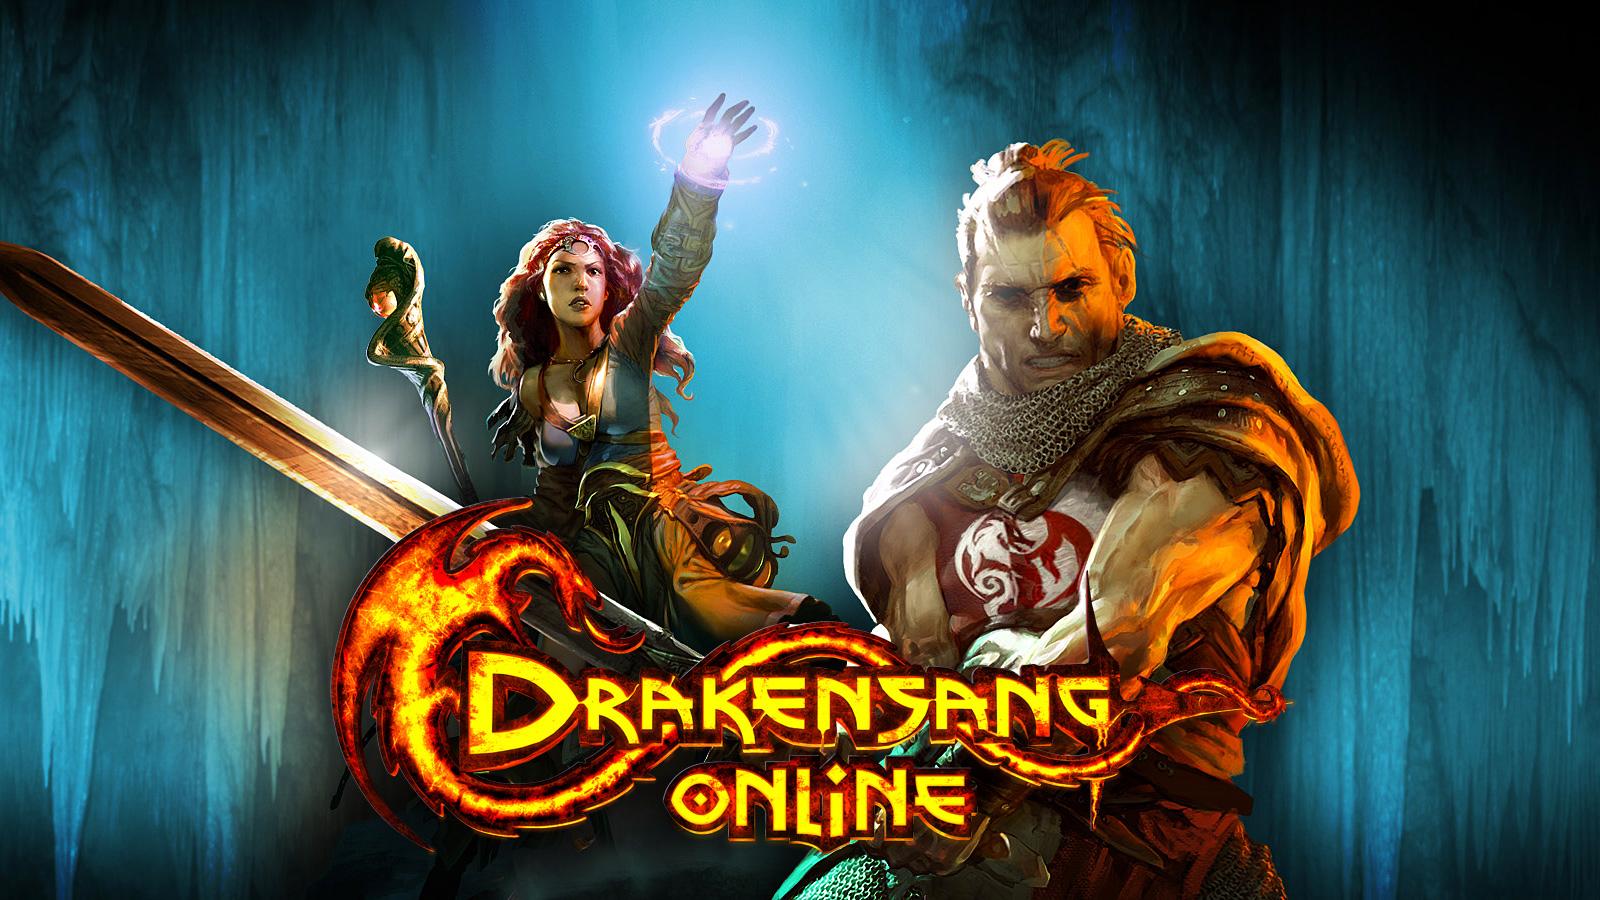 Drakensang Online - Hack and Slay Game